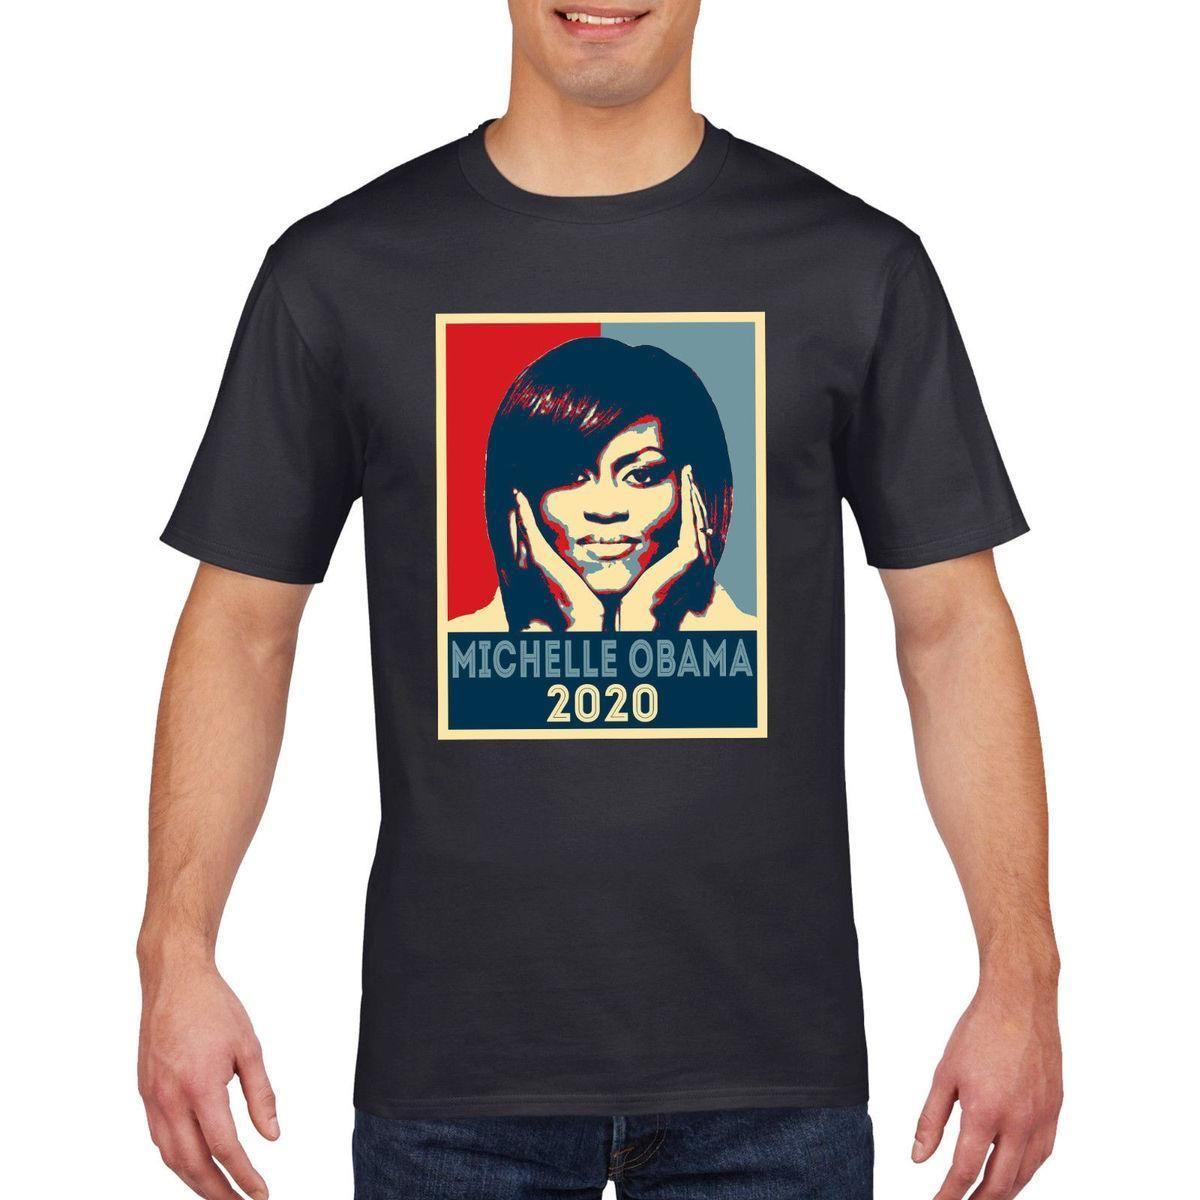 fd1d5279 Michelle Obama 2020 T Shirt America Election President Trump USA T Shirt Tee  809 Tee Shirts Mens T Shirts From Yuxin0010, $17.25  DHgate.Com